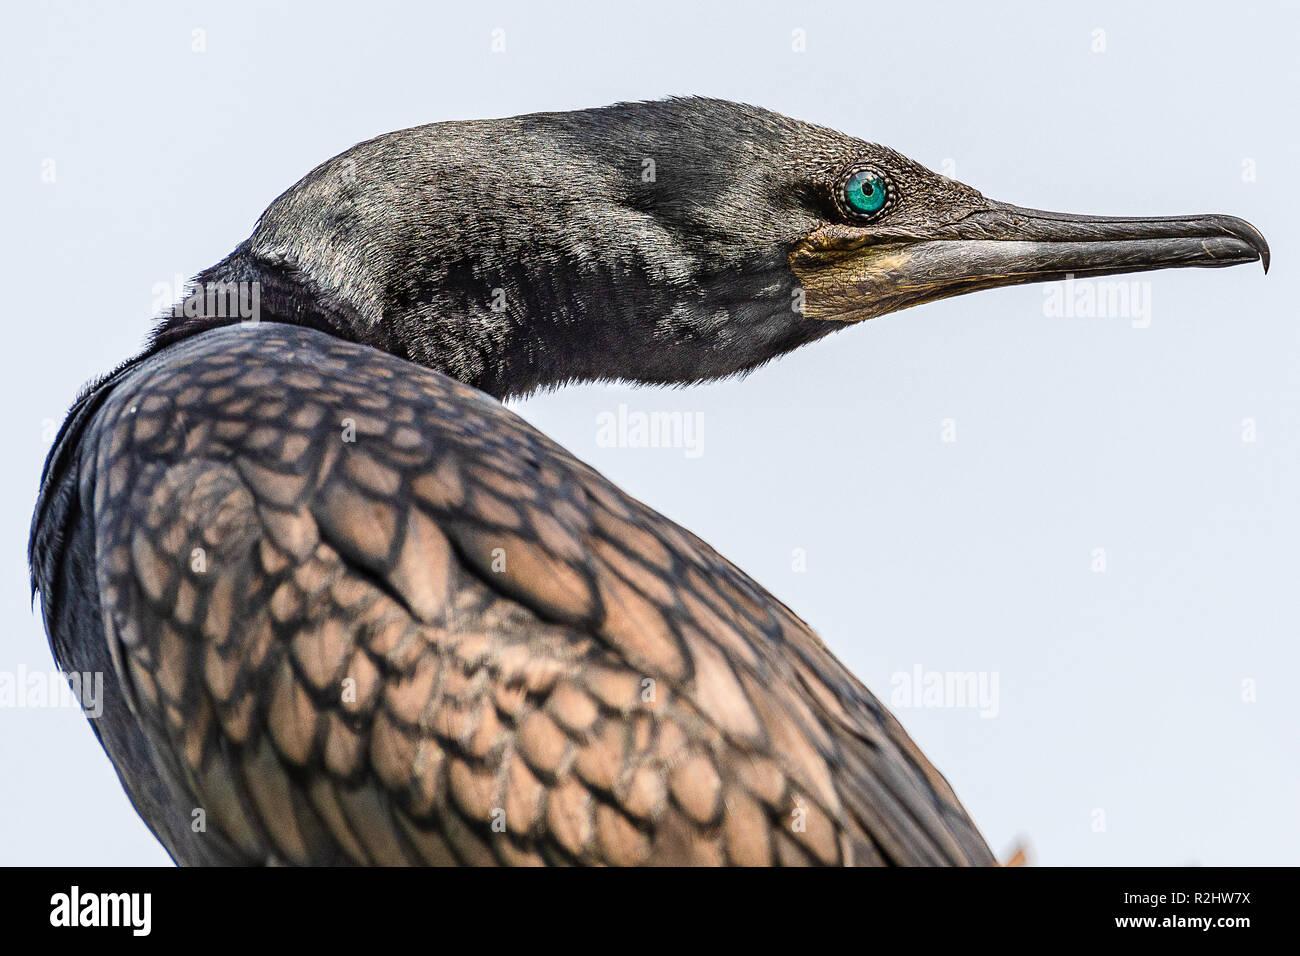 Indian cormorant - Stock Image